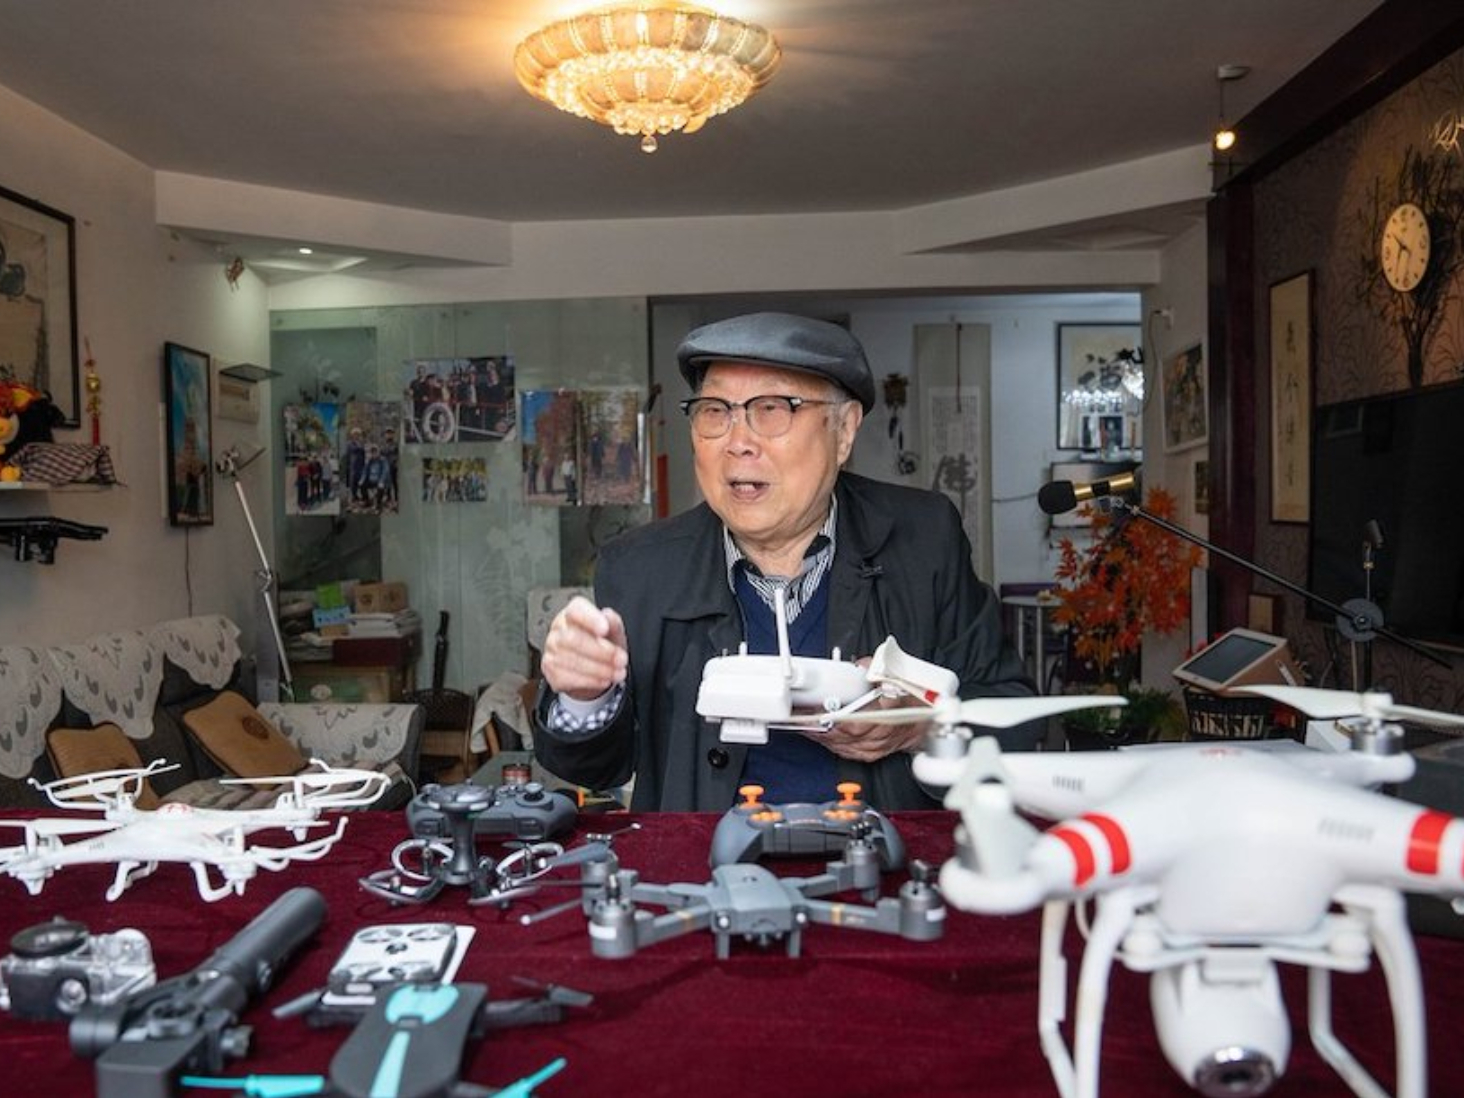 Elderly people in China ride digital economy wave